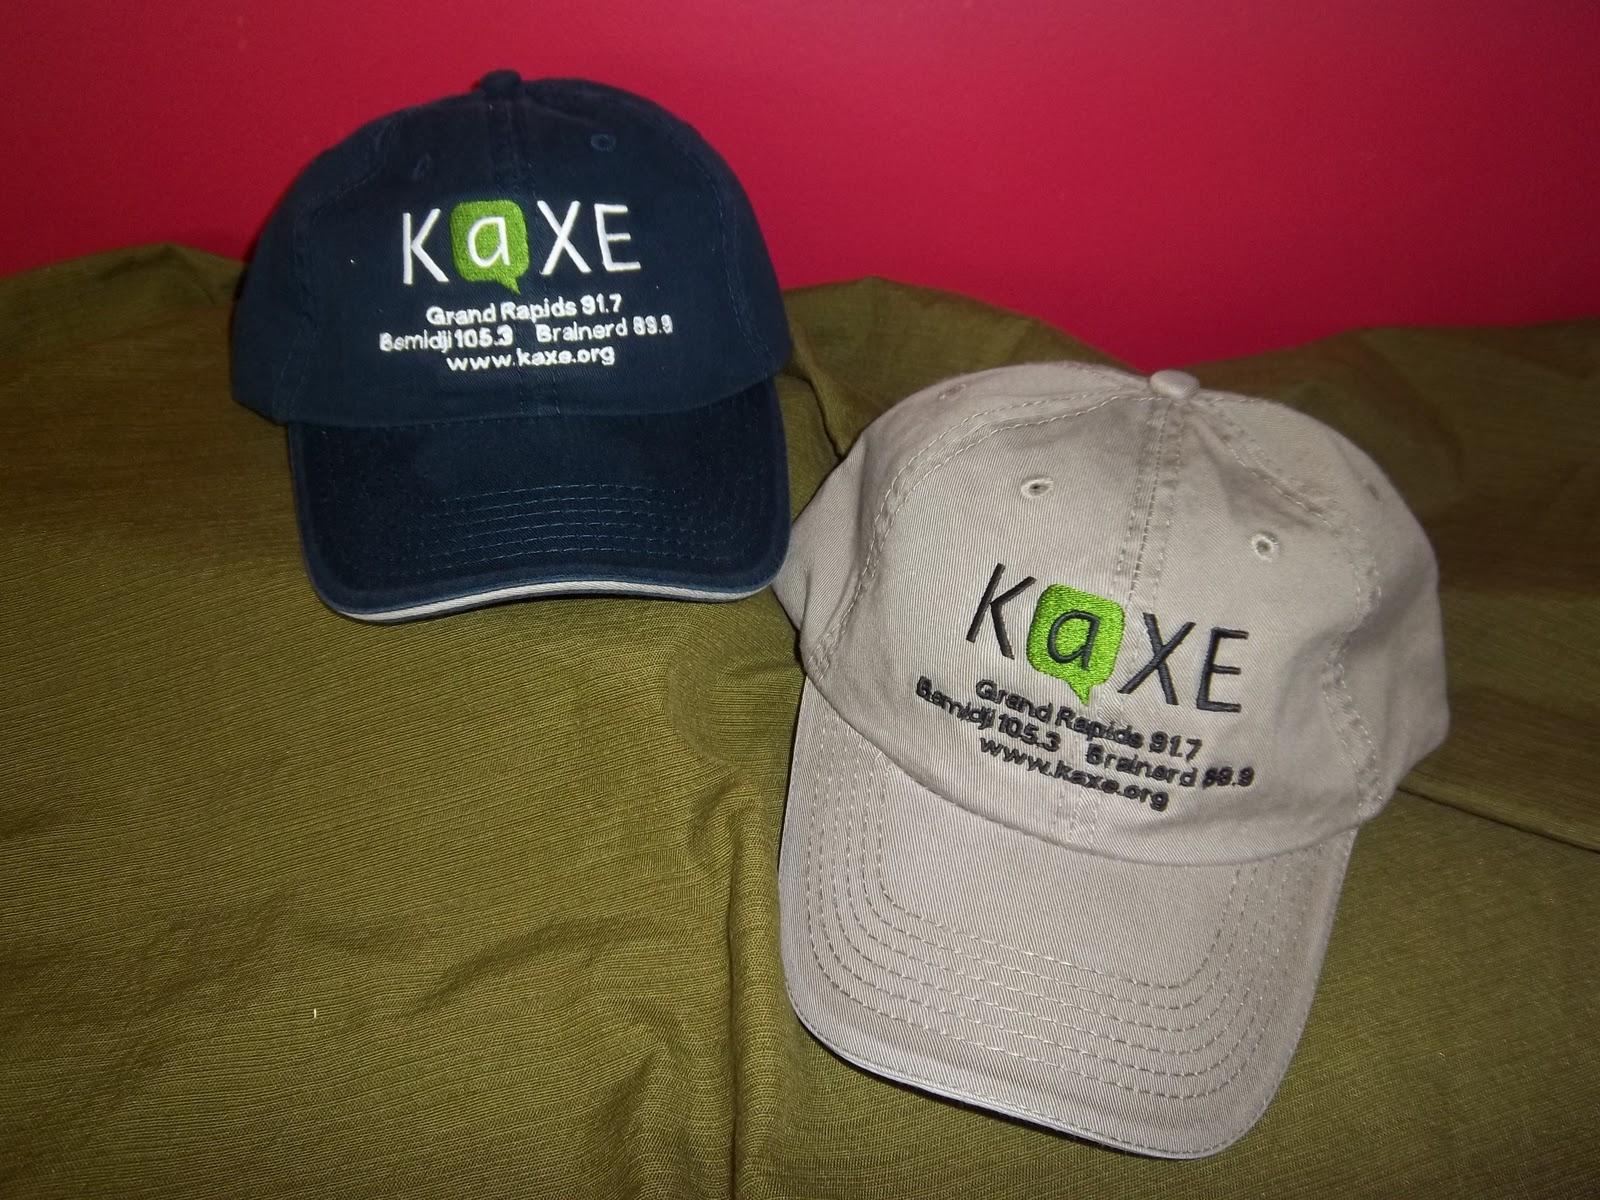 http://1.bp.blogspot.com/_OKrG7RRRlIM/TRJcir6mB3I/AAAAAAAACOY/PqXxtYInvEU/s1600/KAXE_caps.jpg